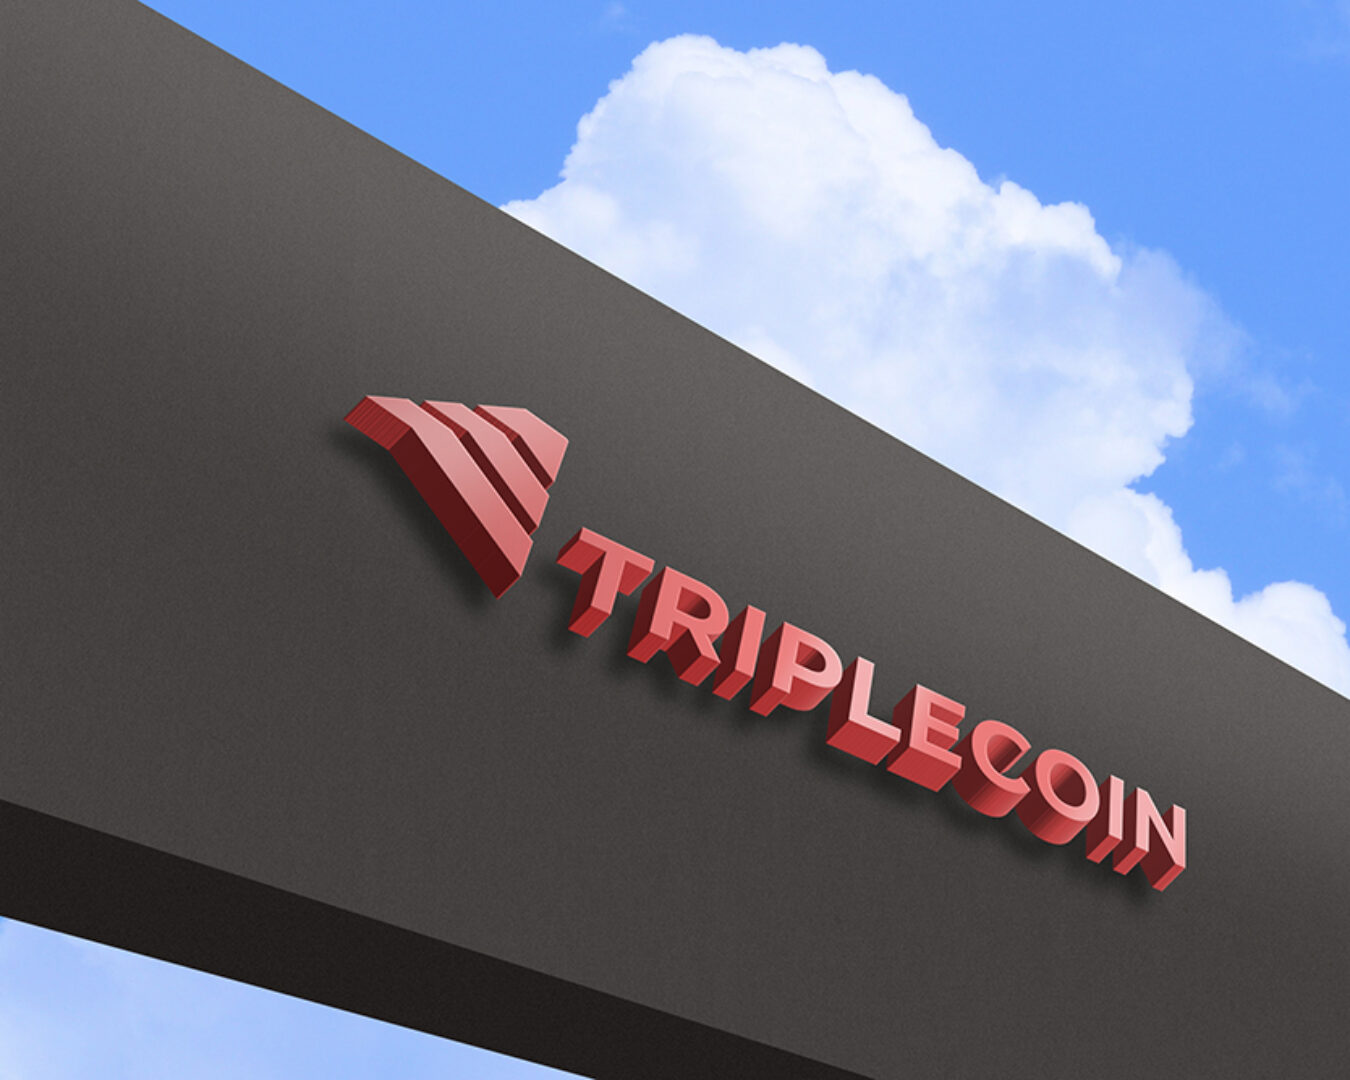 Triplecoin